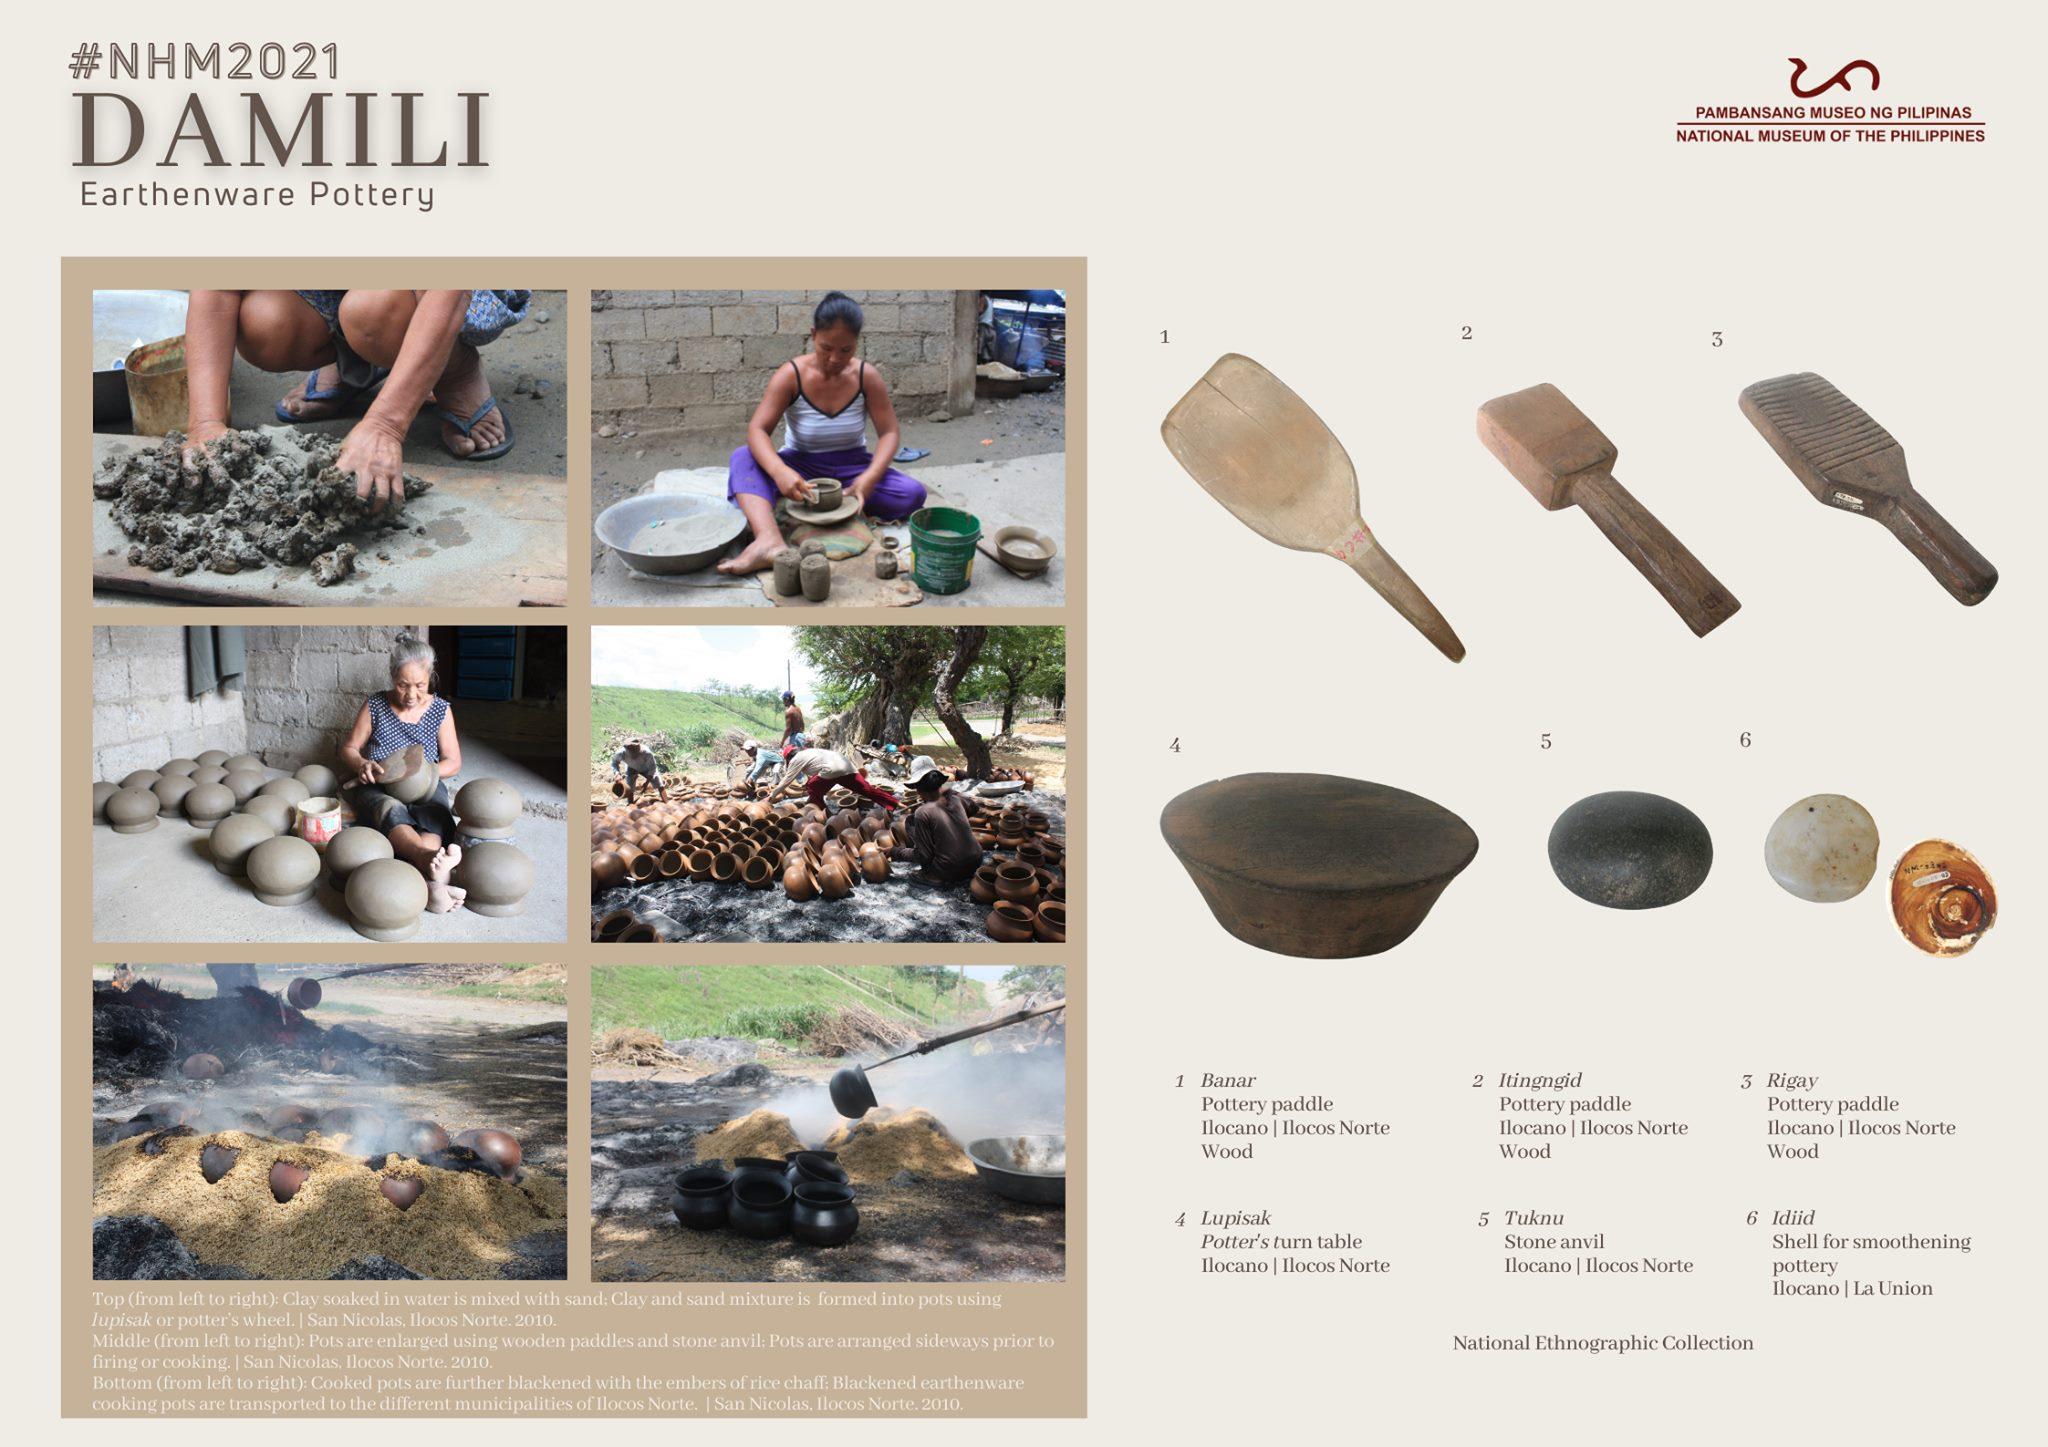 Damili Earthenware Pottery